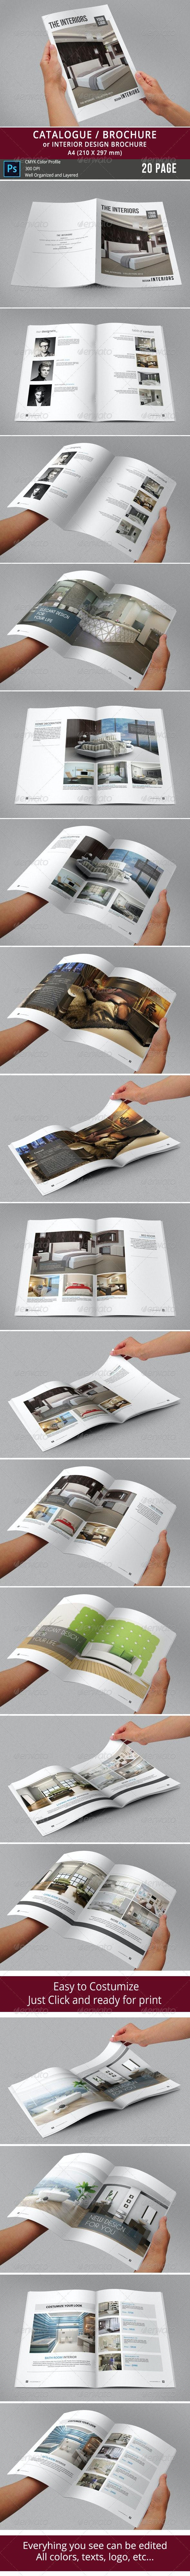 Catalogue / Brochure - Catalogs Brochures